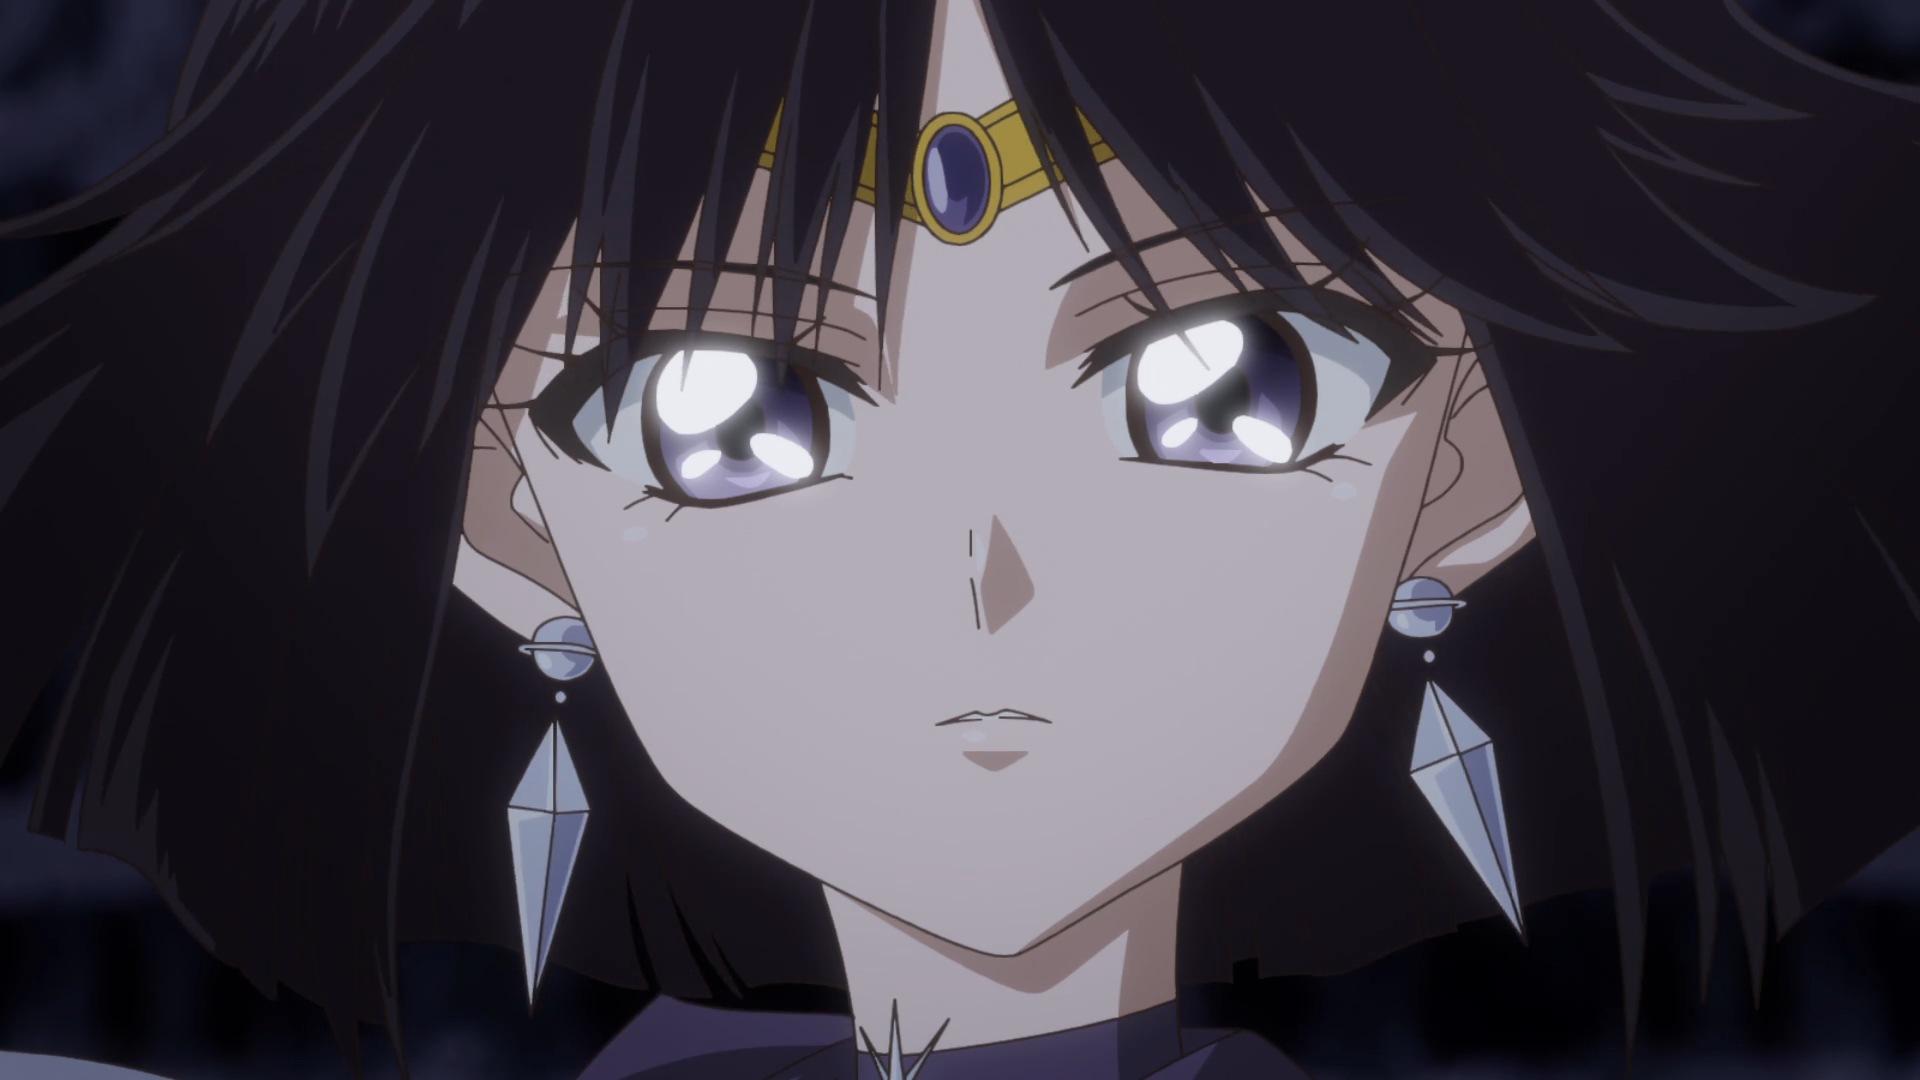 Pretty Anime Girl Wallpaper Sailor Moon Crystal Act 37 Sailor Saturn Sailor Moon News